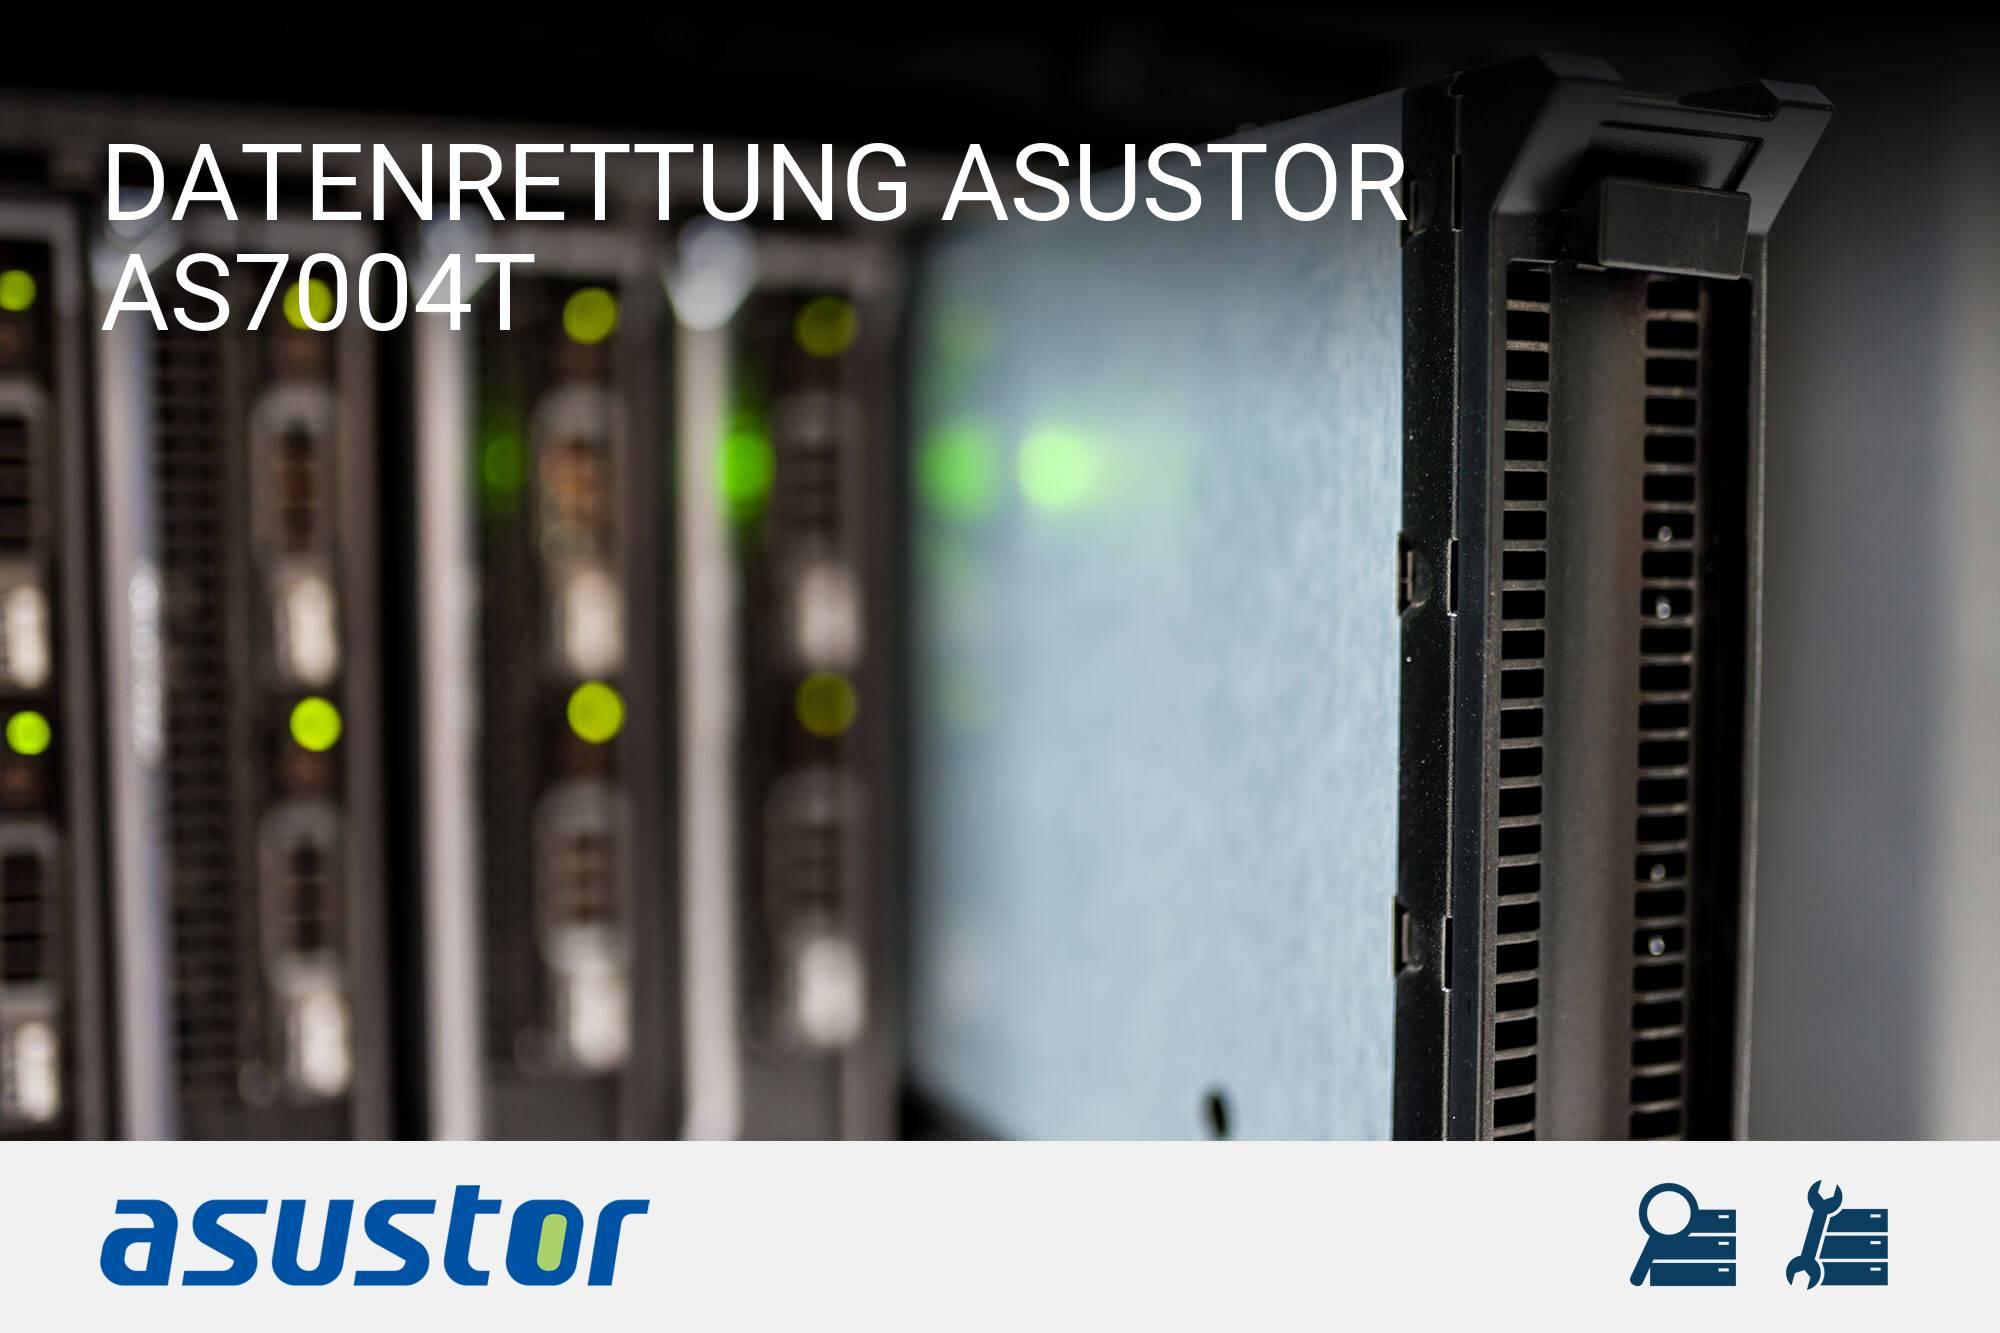 Asustor AS7004T